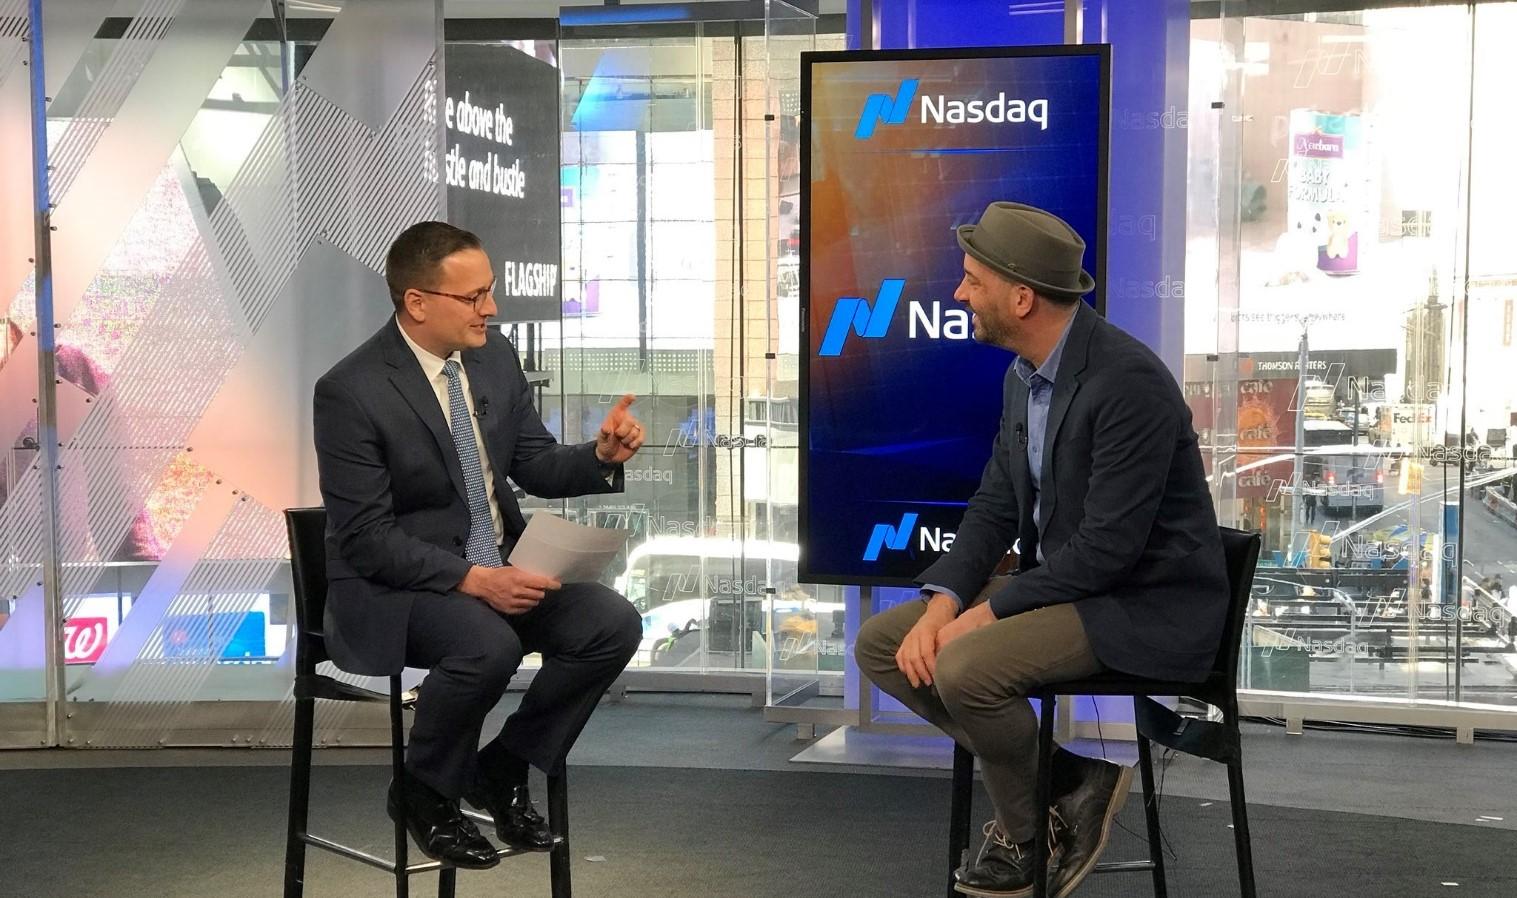 Reverb founder in an interview on NASDAQ